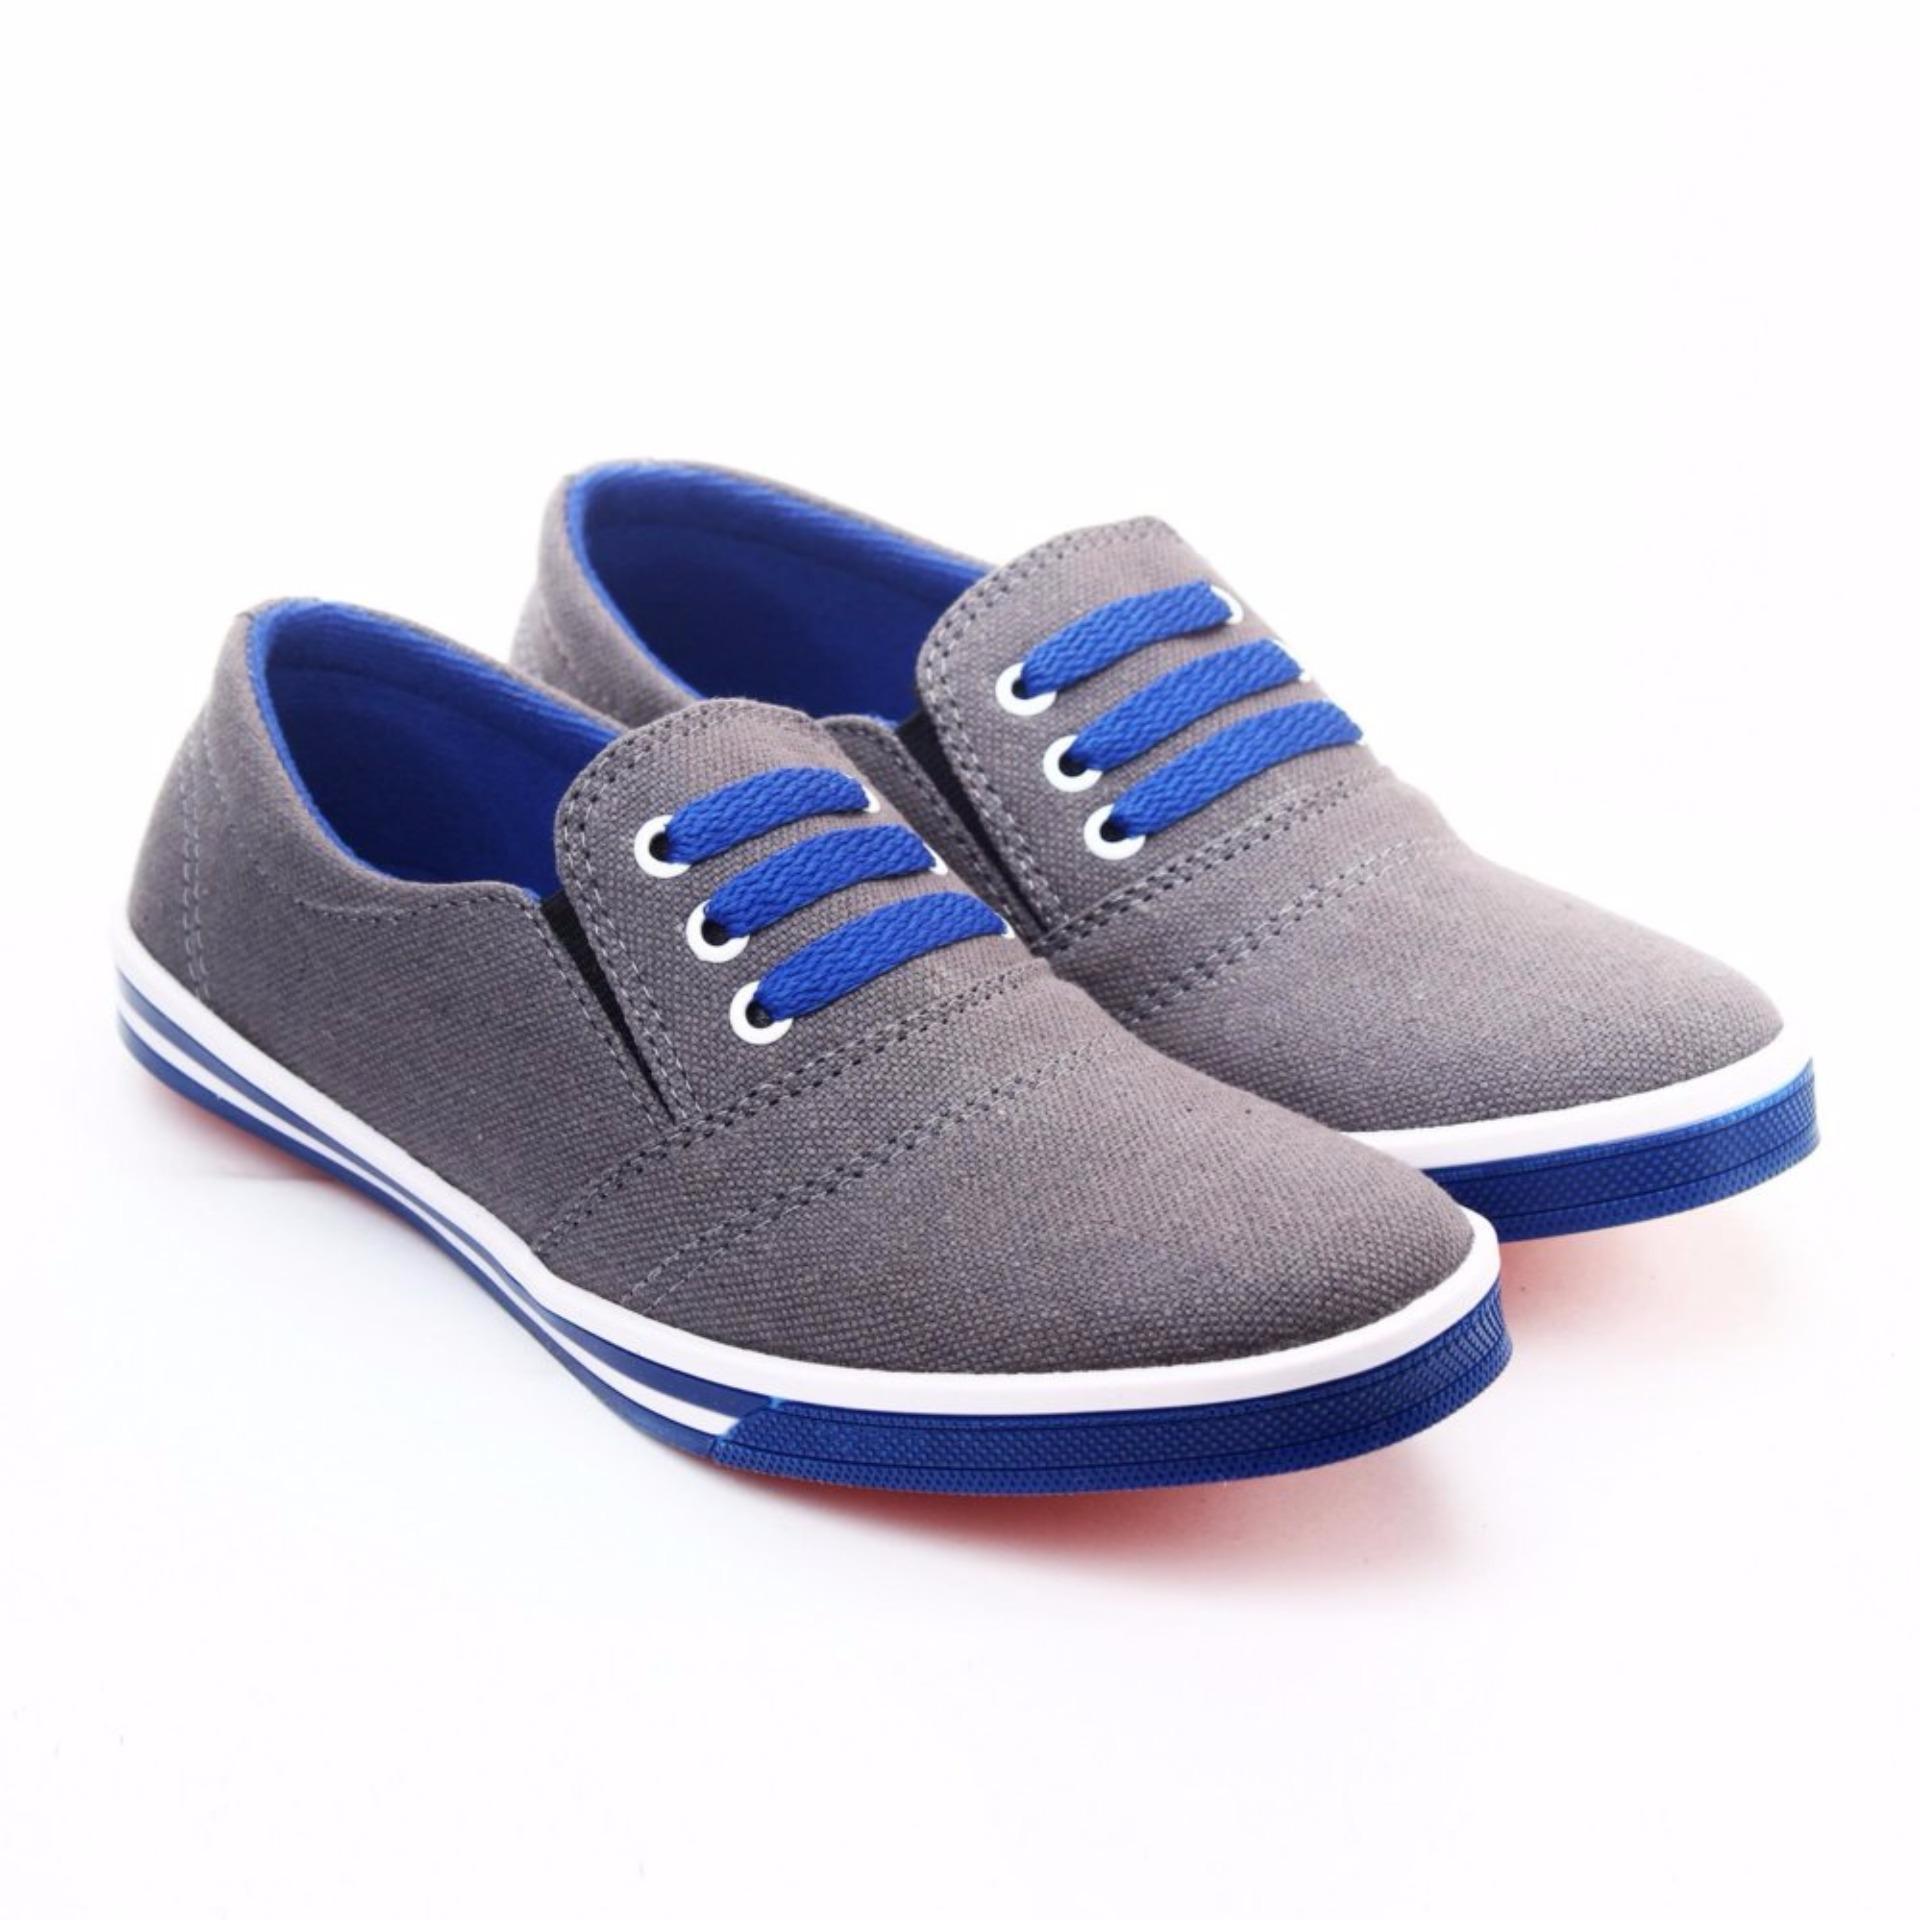 Cocok digunakan sehari-hari Yutaka Sepatu Kets Sneakers Abu-abu - Biru